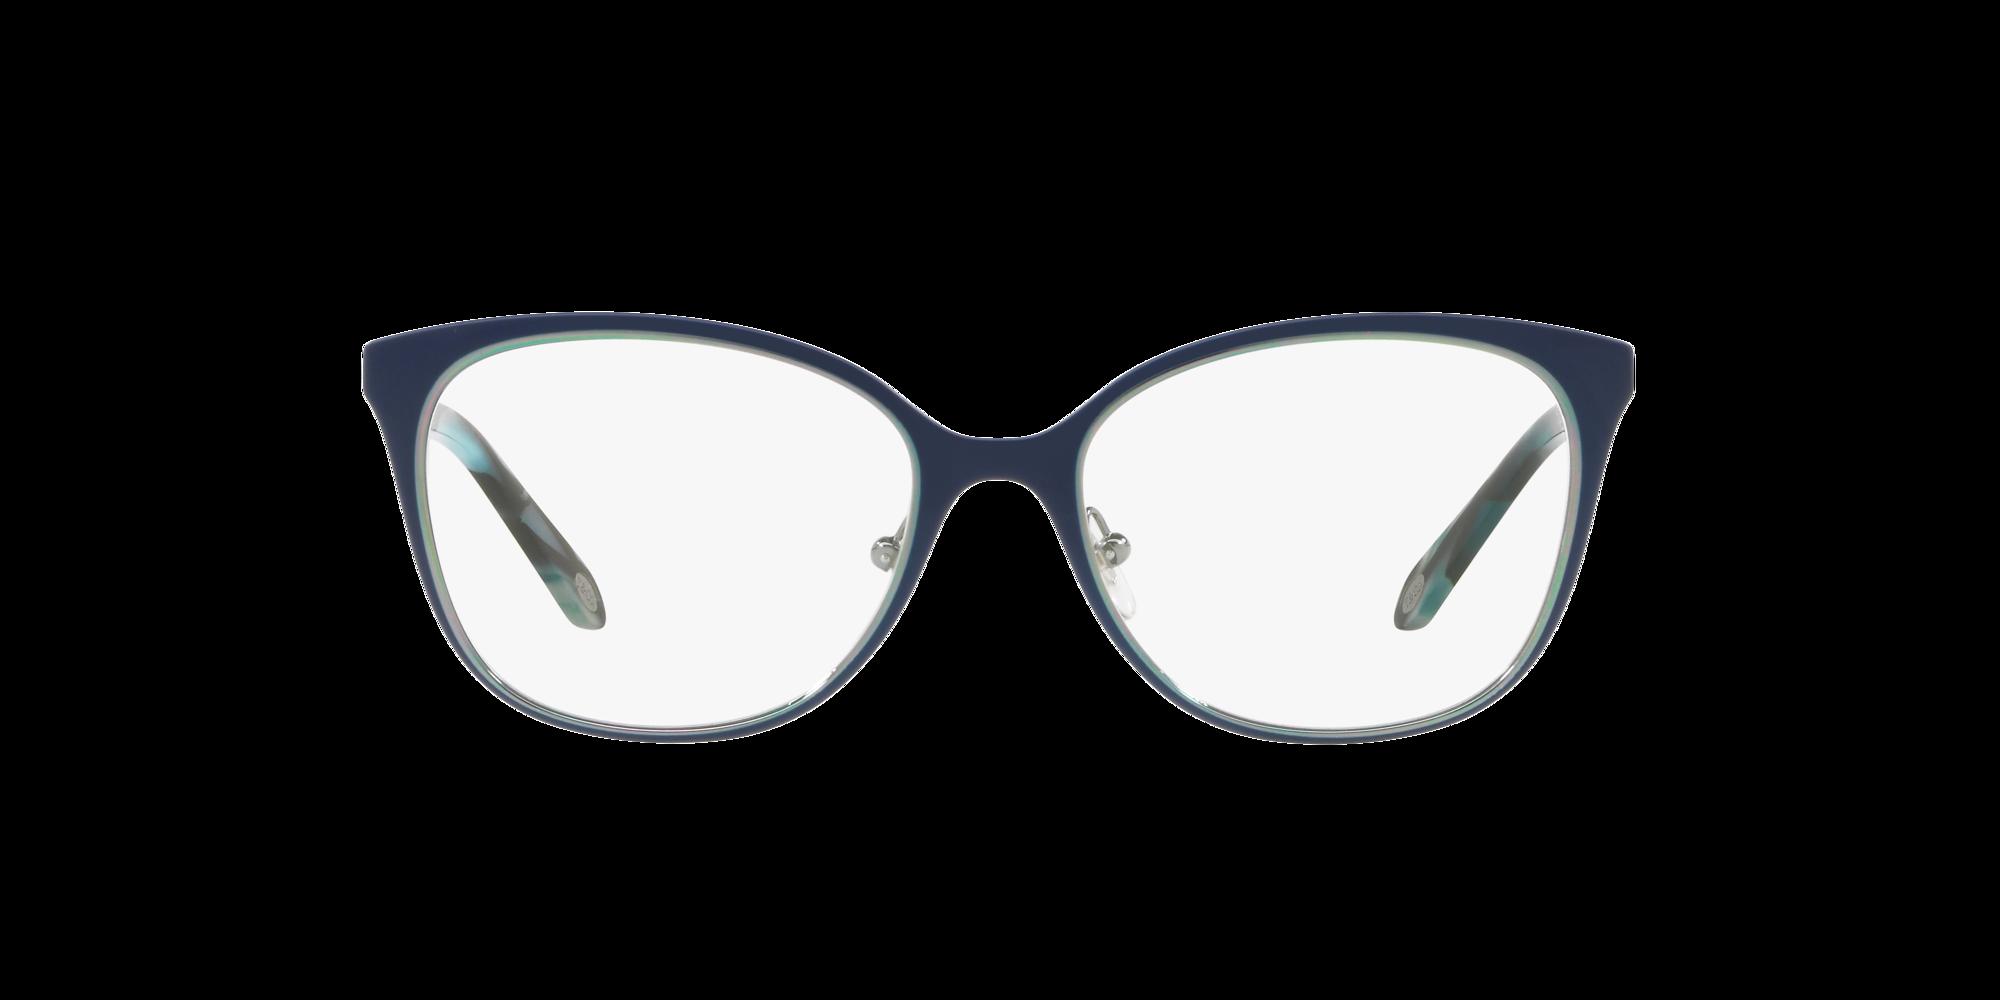 Tiffany TF2165F Square Eyeglasses For Women - AllureAid.com